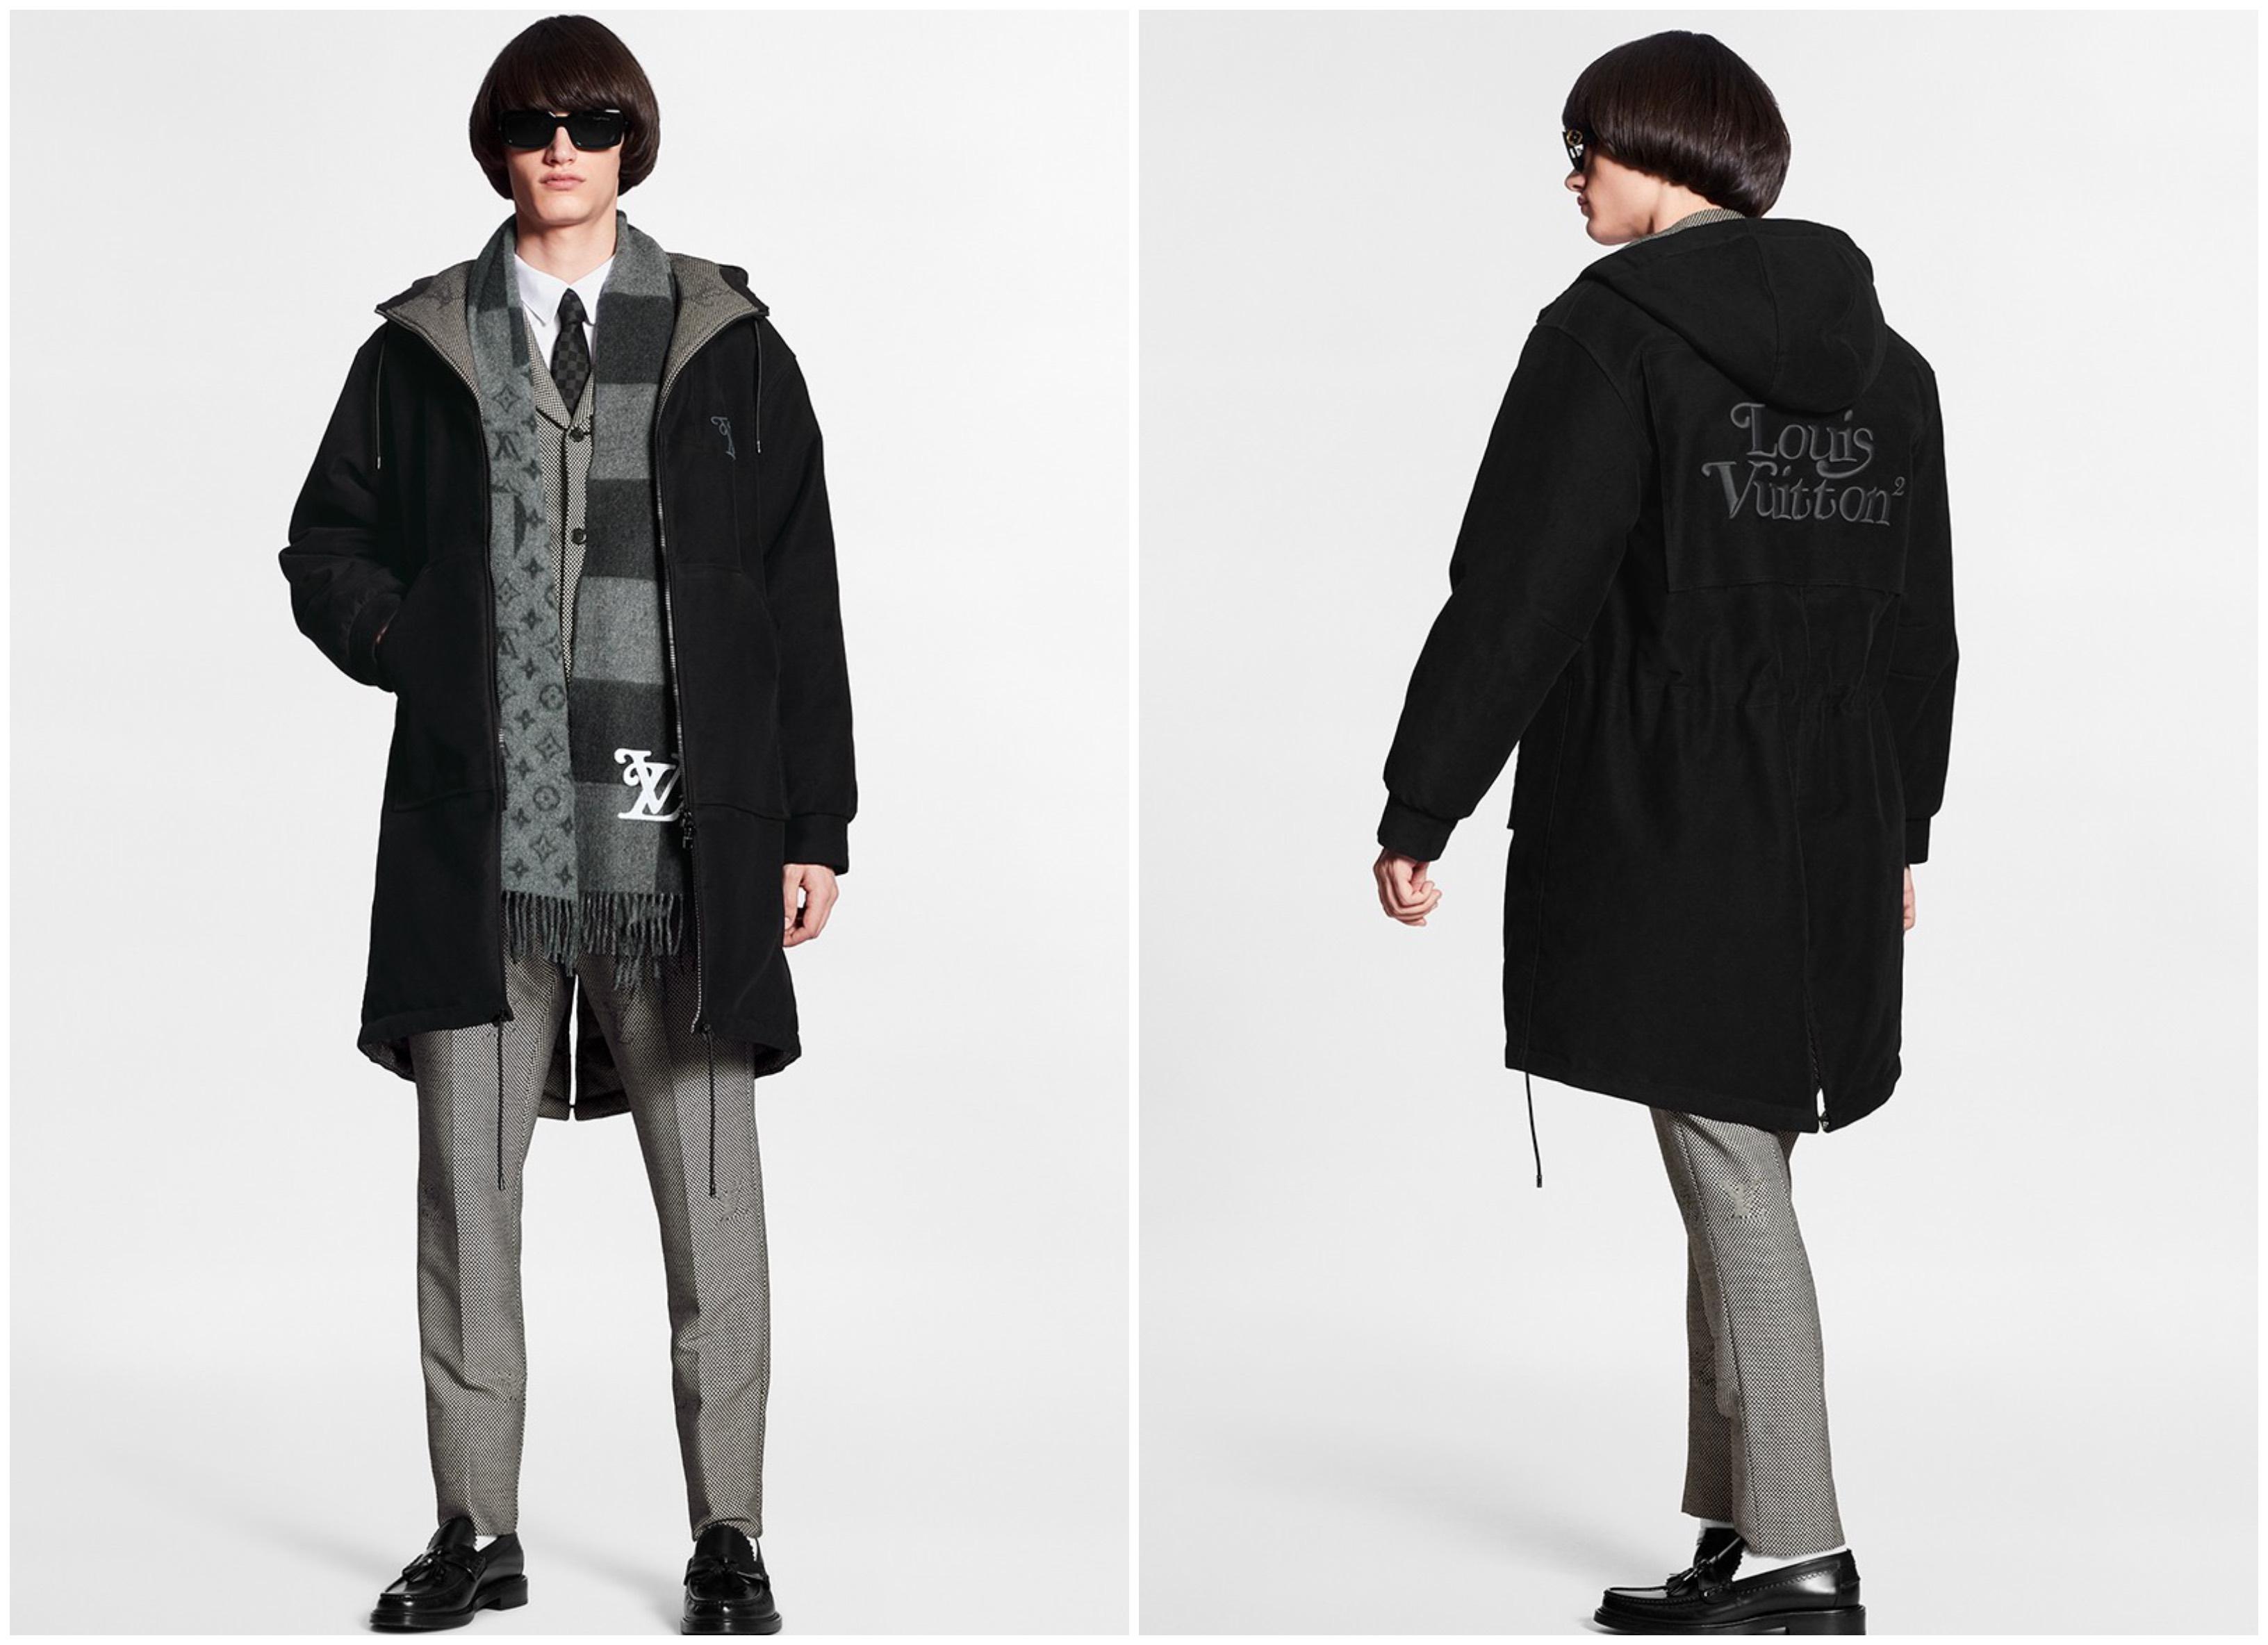 Louis Vuitton bst lv² áo khoác parka